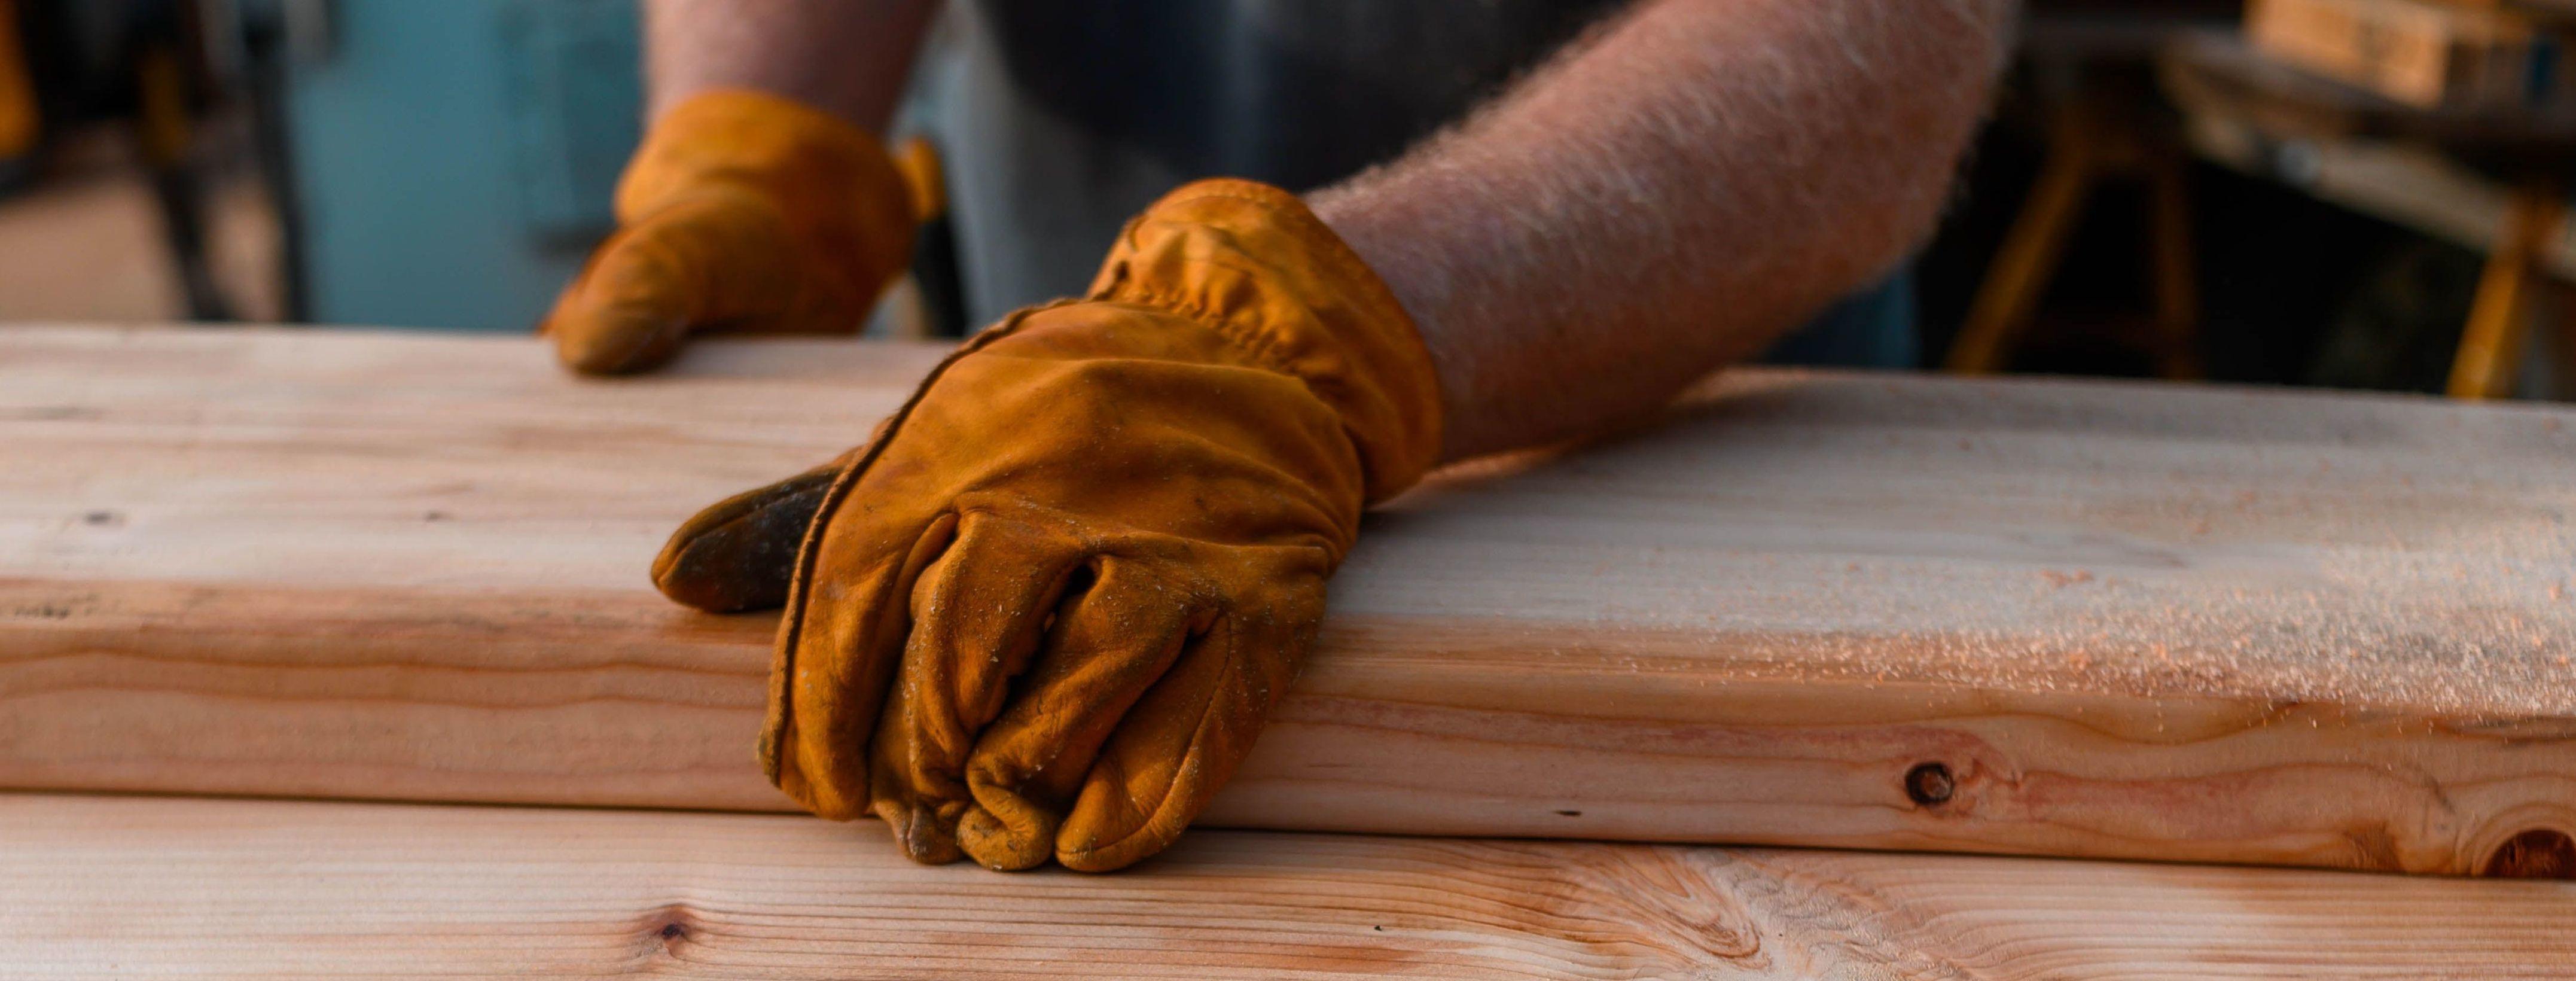 Build Site: Construction Volunteer